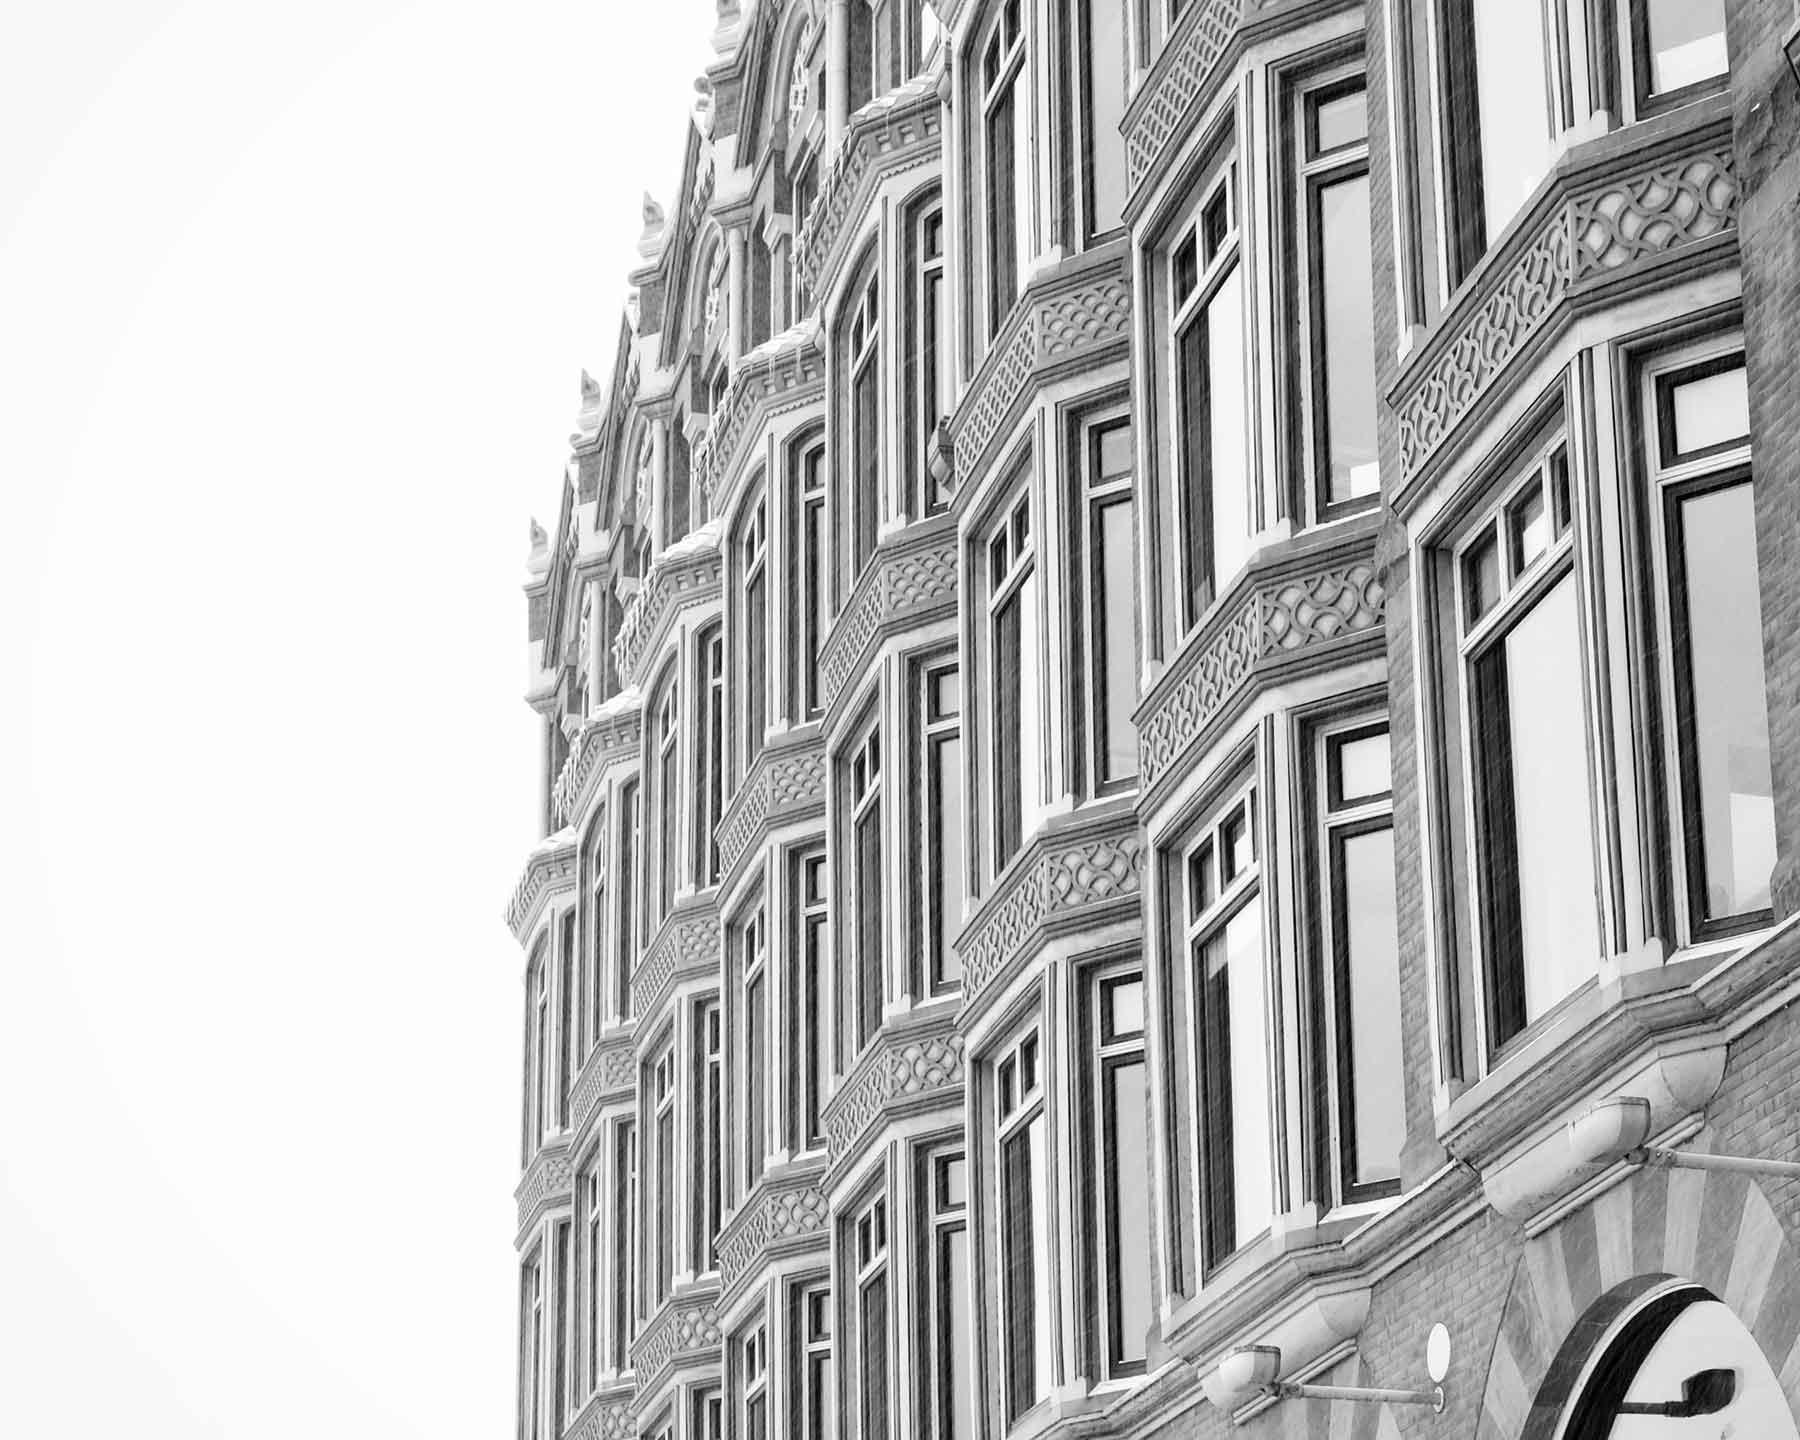 classic architecture building